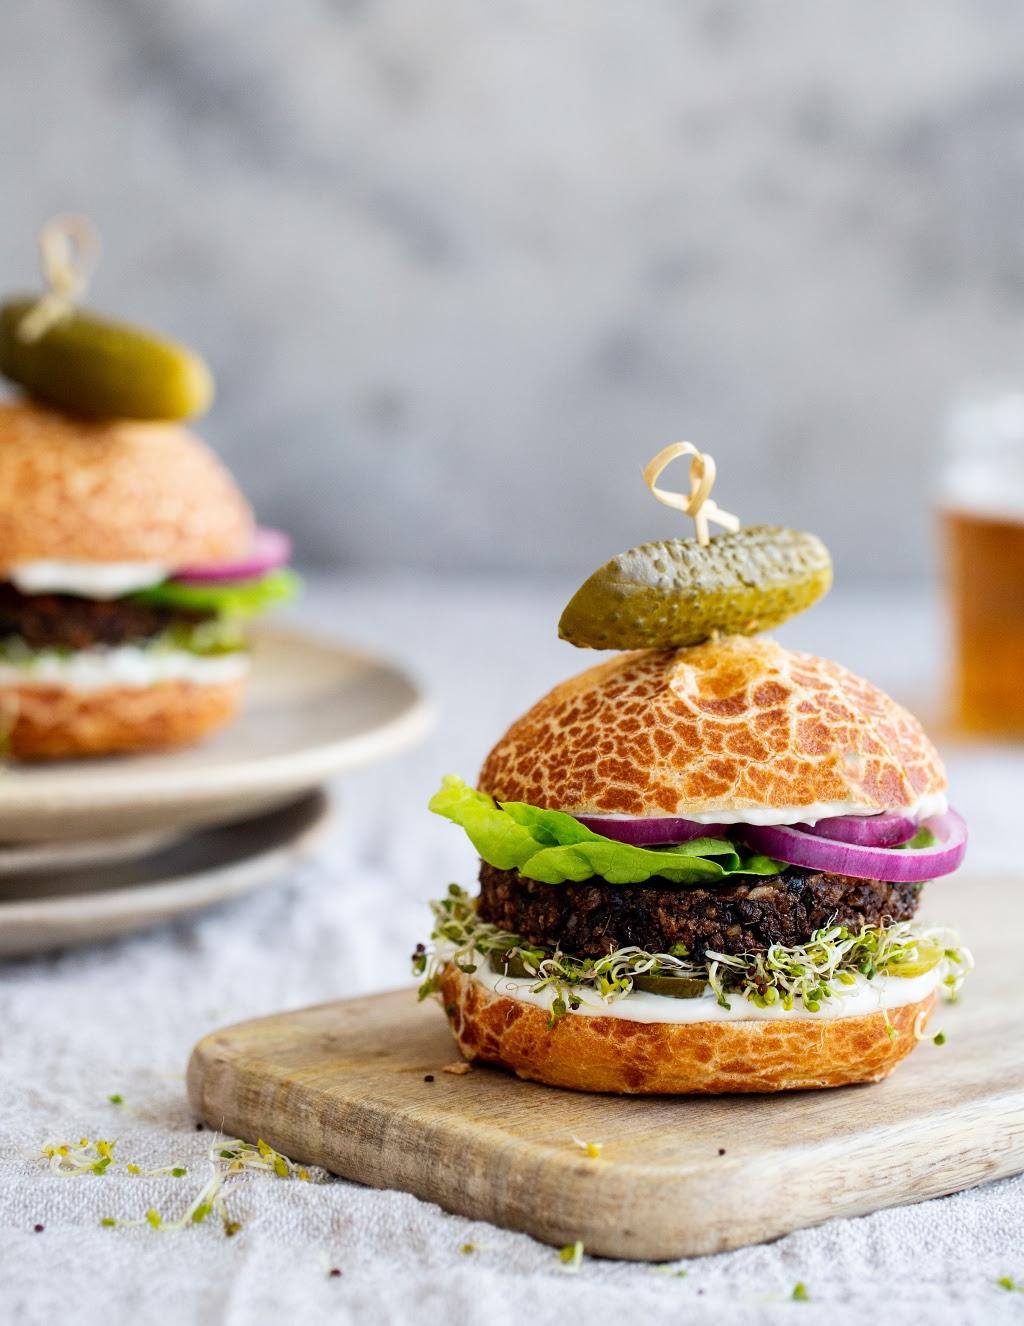 Go Vegan on National Burger Day